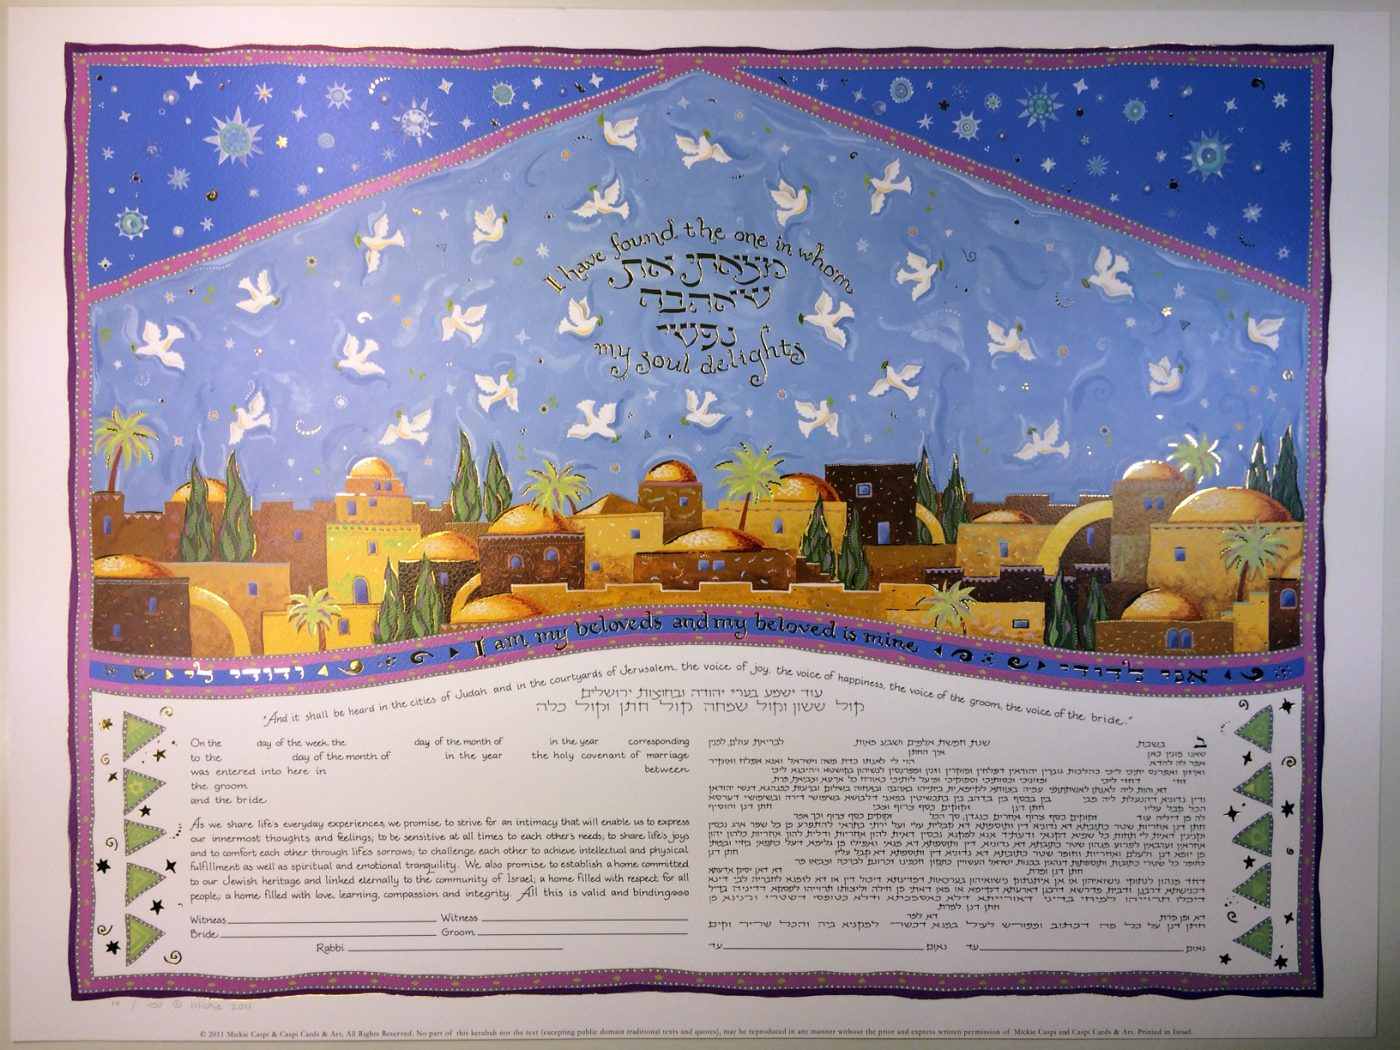 11-2 Celestial Jerusalem Ketubah by Mickie Caspi, Conservative text with Lieberman Clause